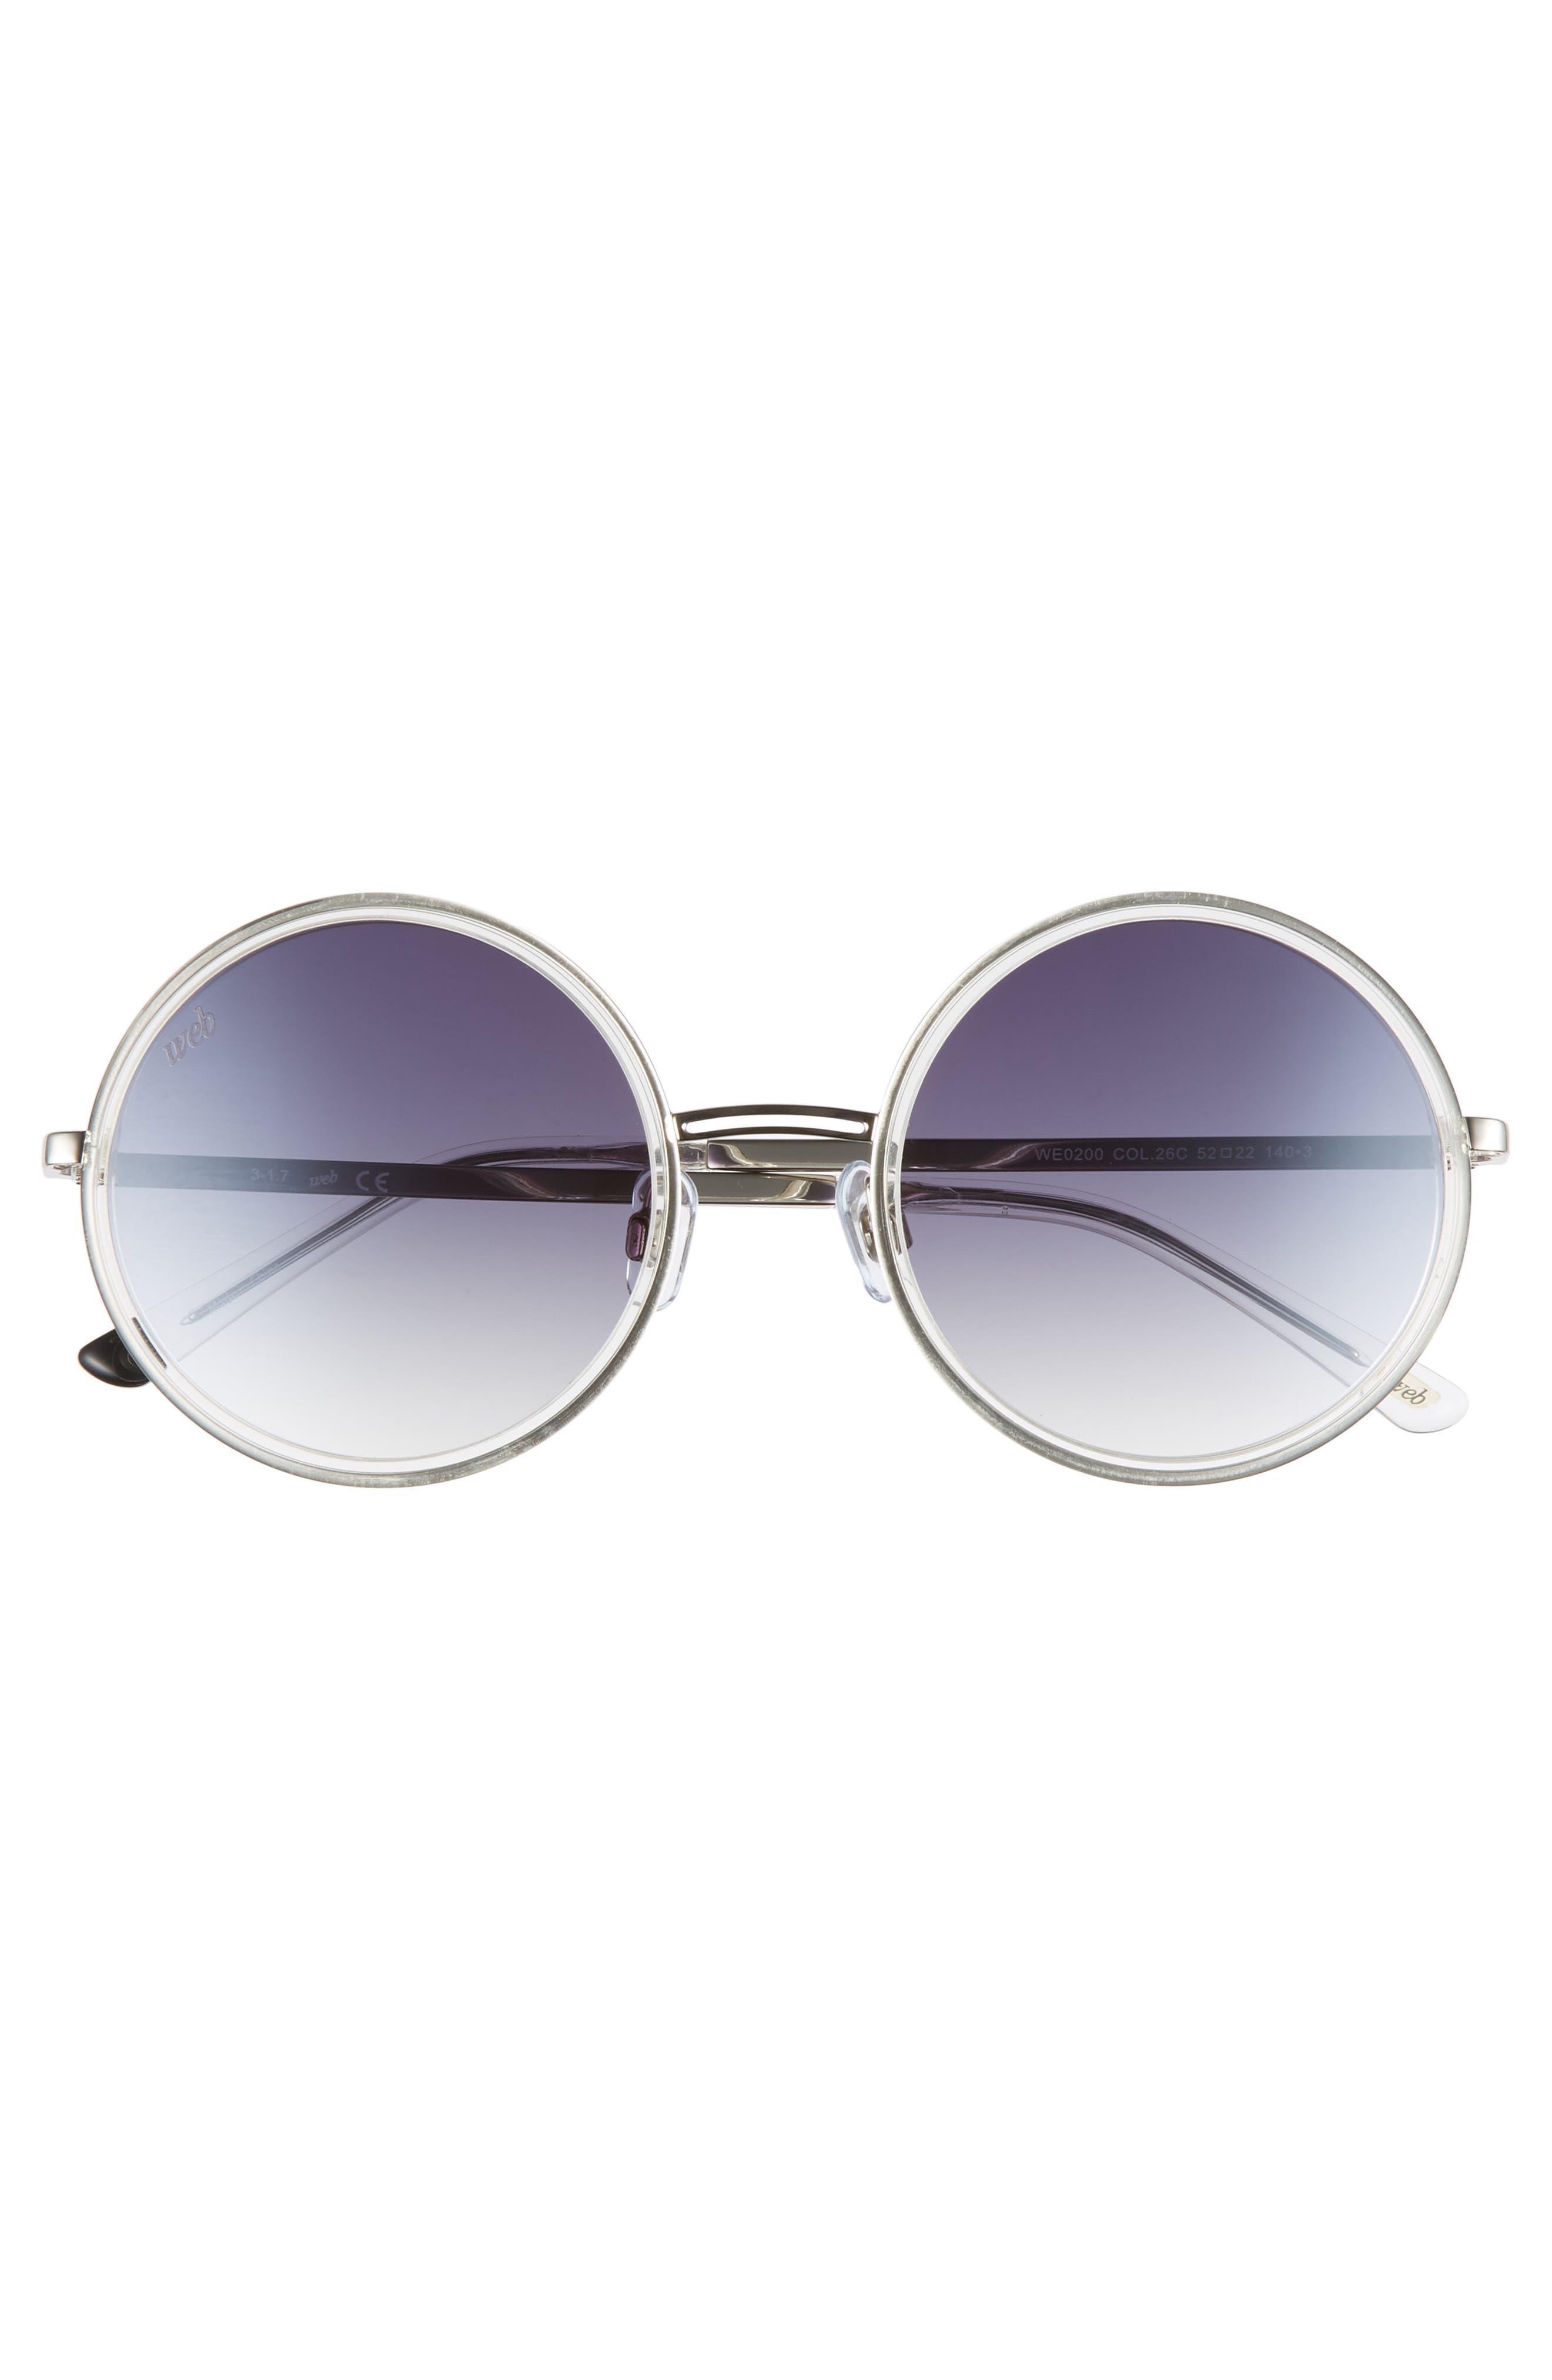 52mm Sunglasses,                             Alternate thumbnail 3, color,                             CRYSTAL/ SMOKE